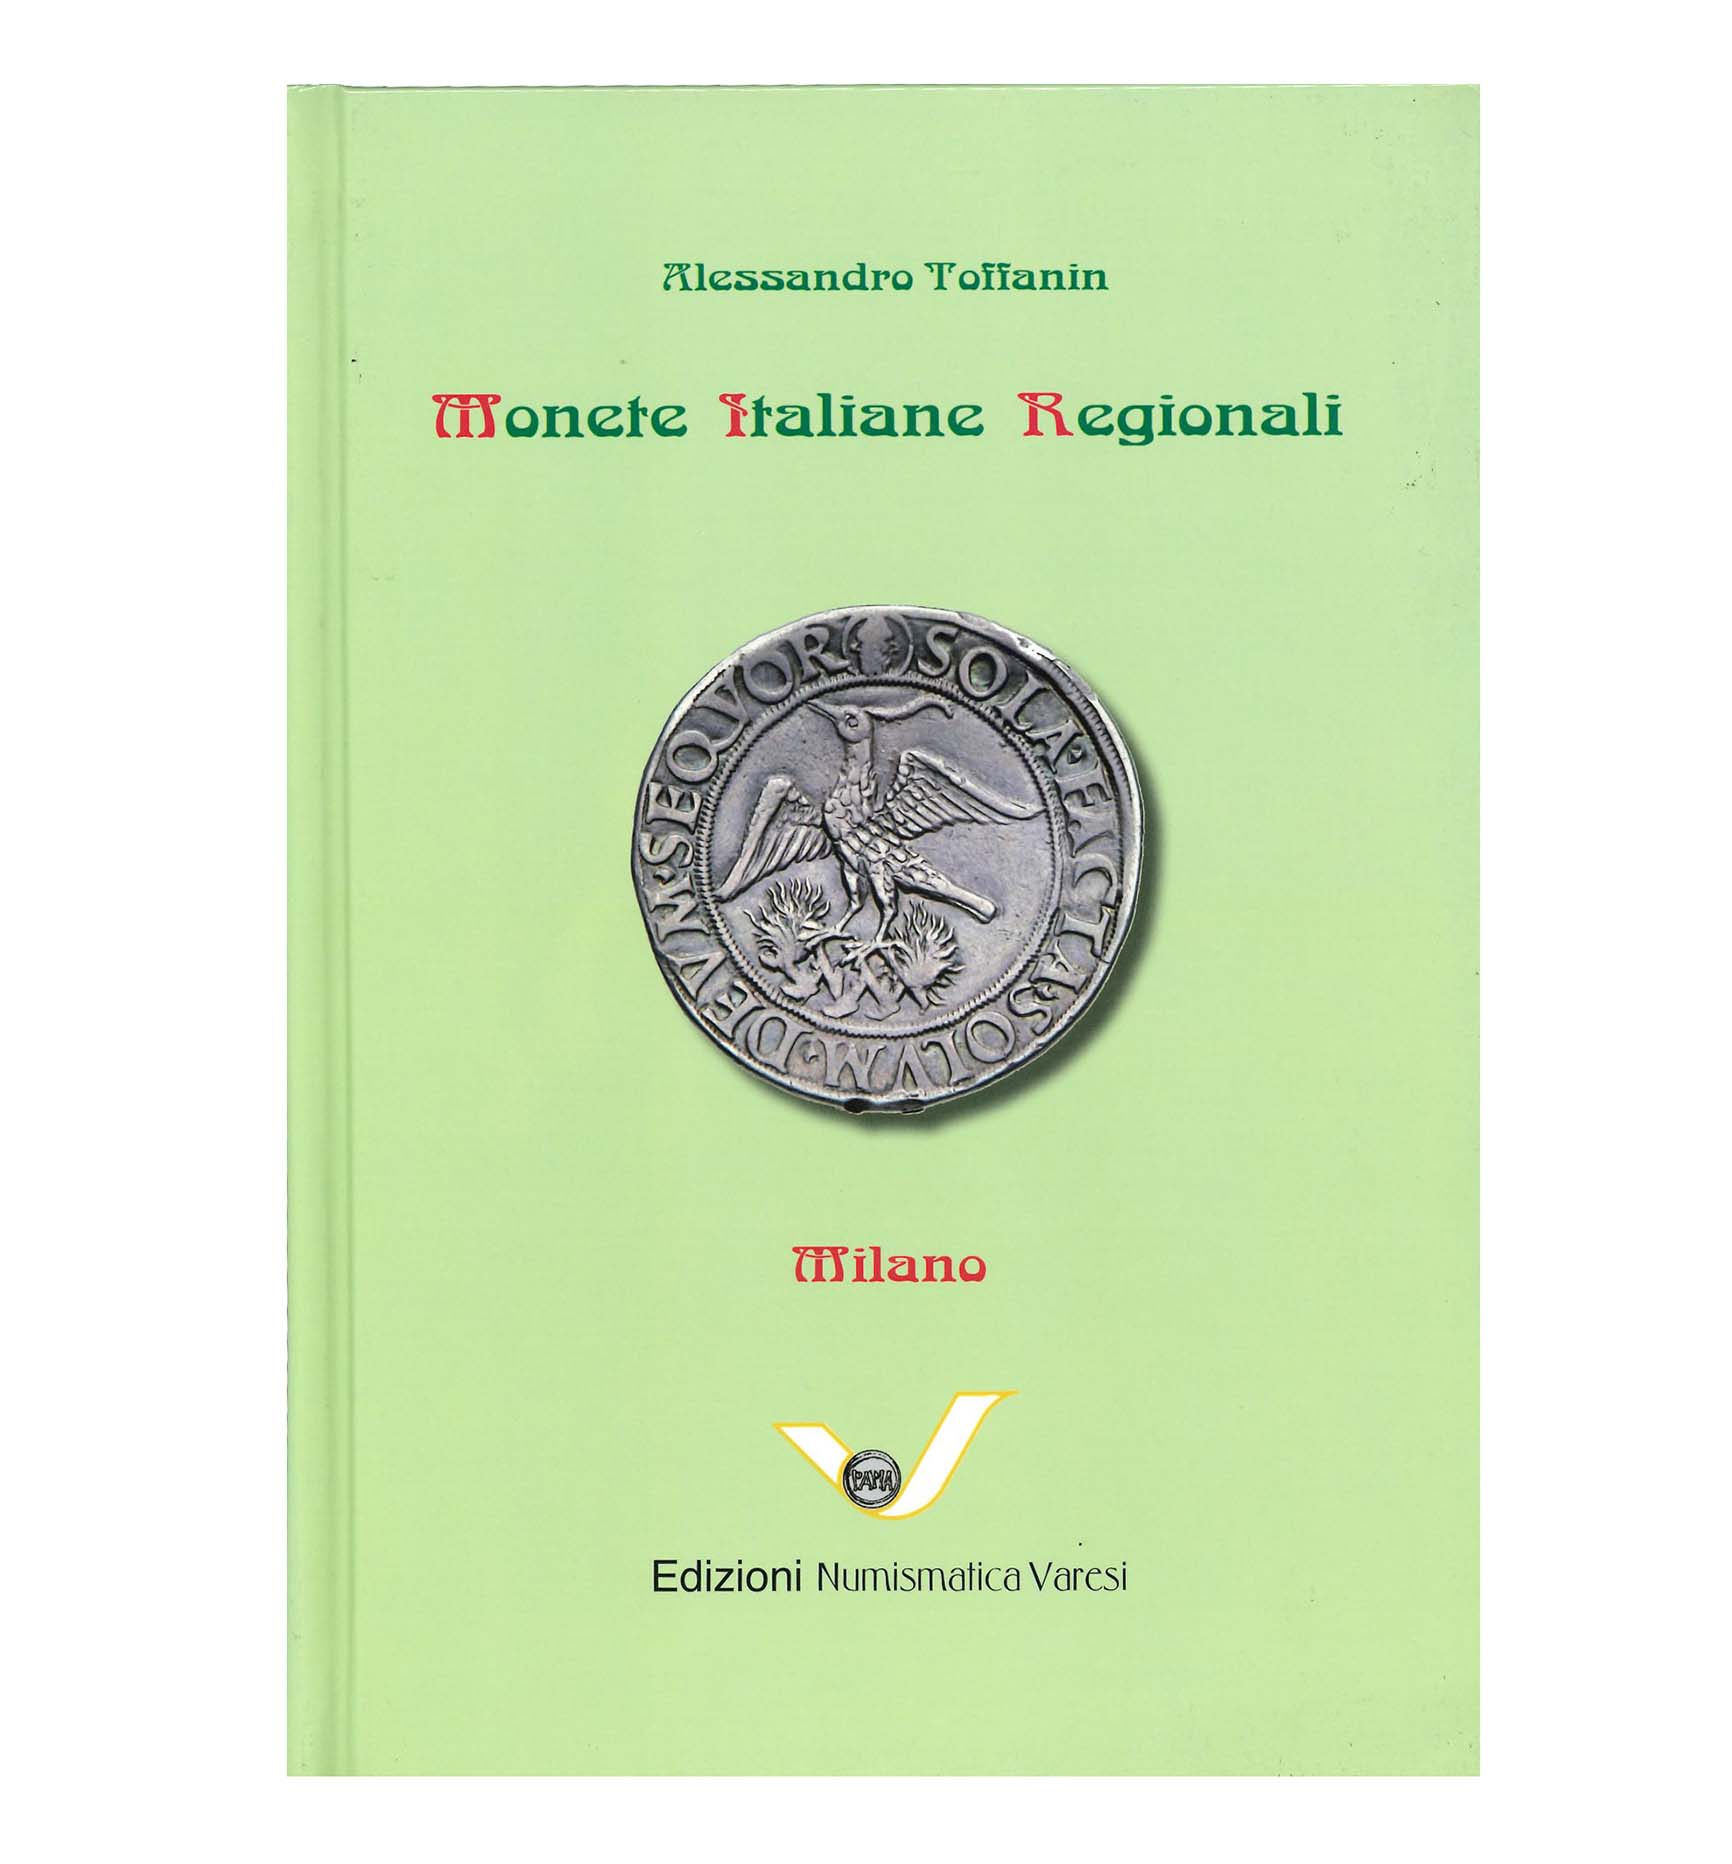 Monete Italiane Regionali - Milano